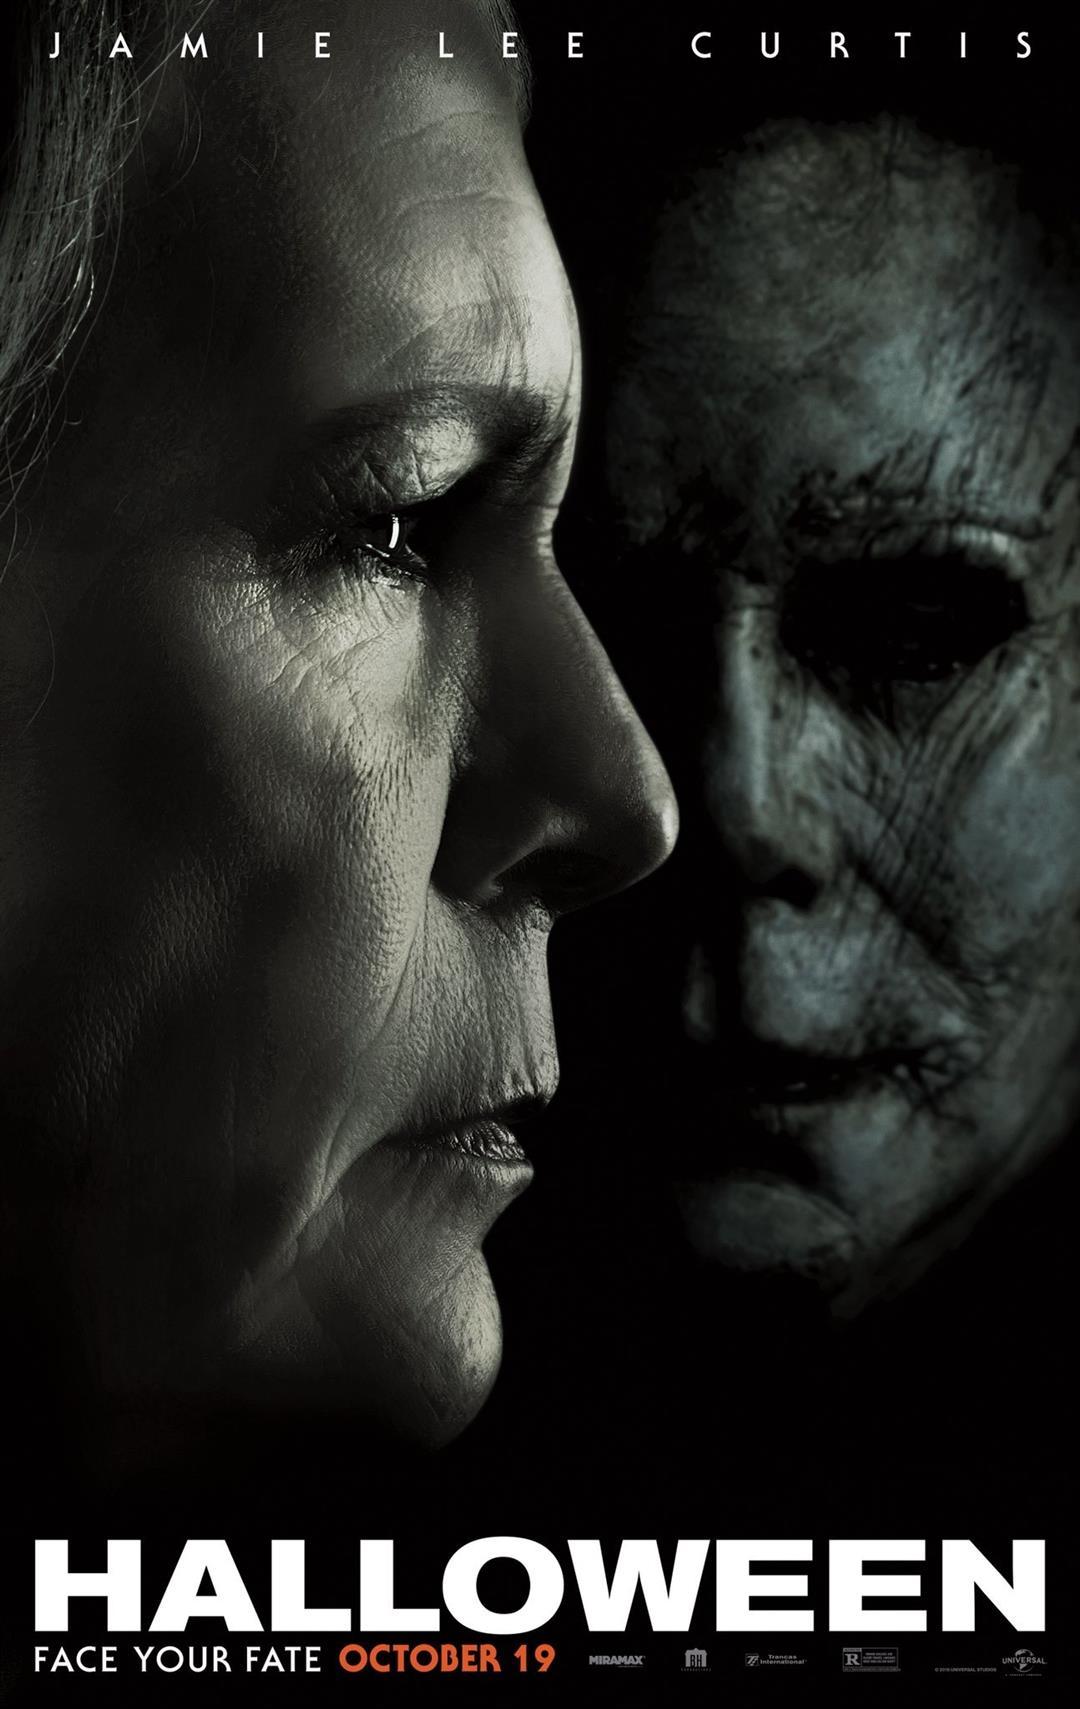 Halloween 2018 Full Movie Free Online